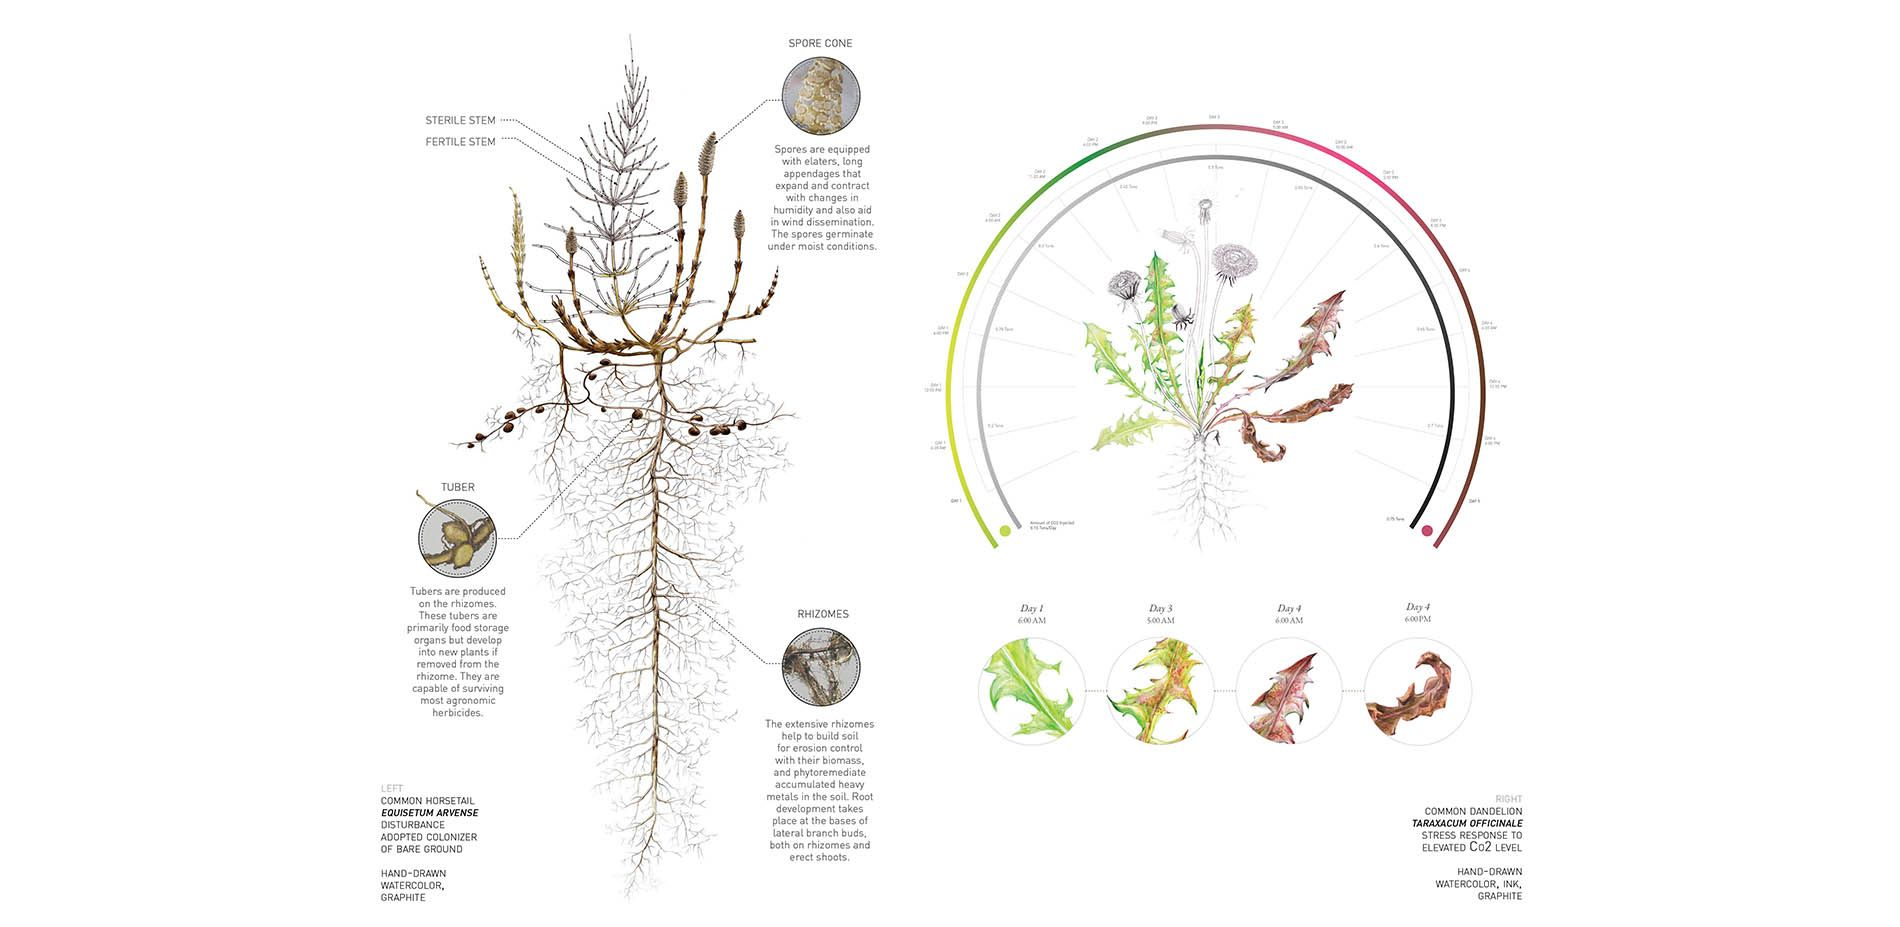 Horsetail Plant Diagram 1993 Mazda B2200 Radio Wiring Common Equisetum Arvense Disturbance Adopted Colonizer Of Bare Ground